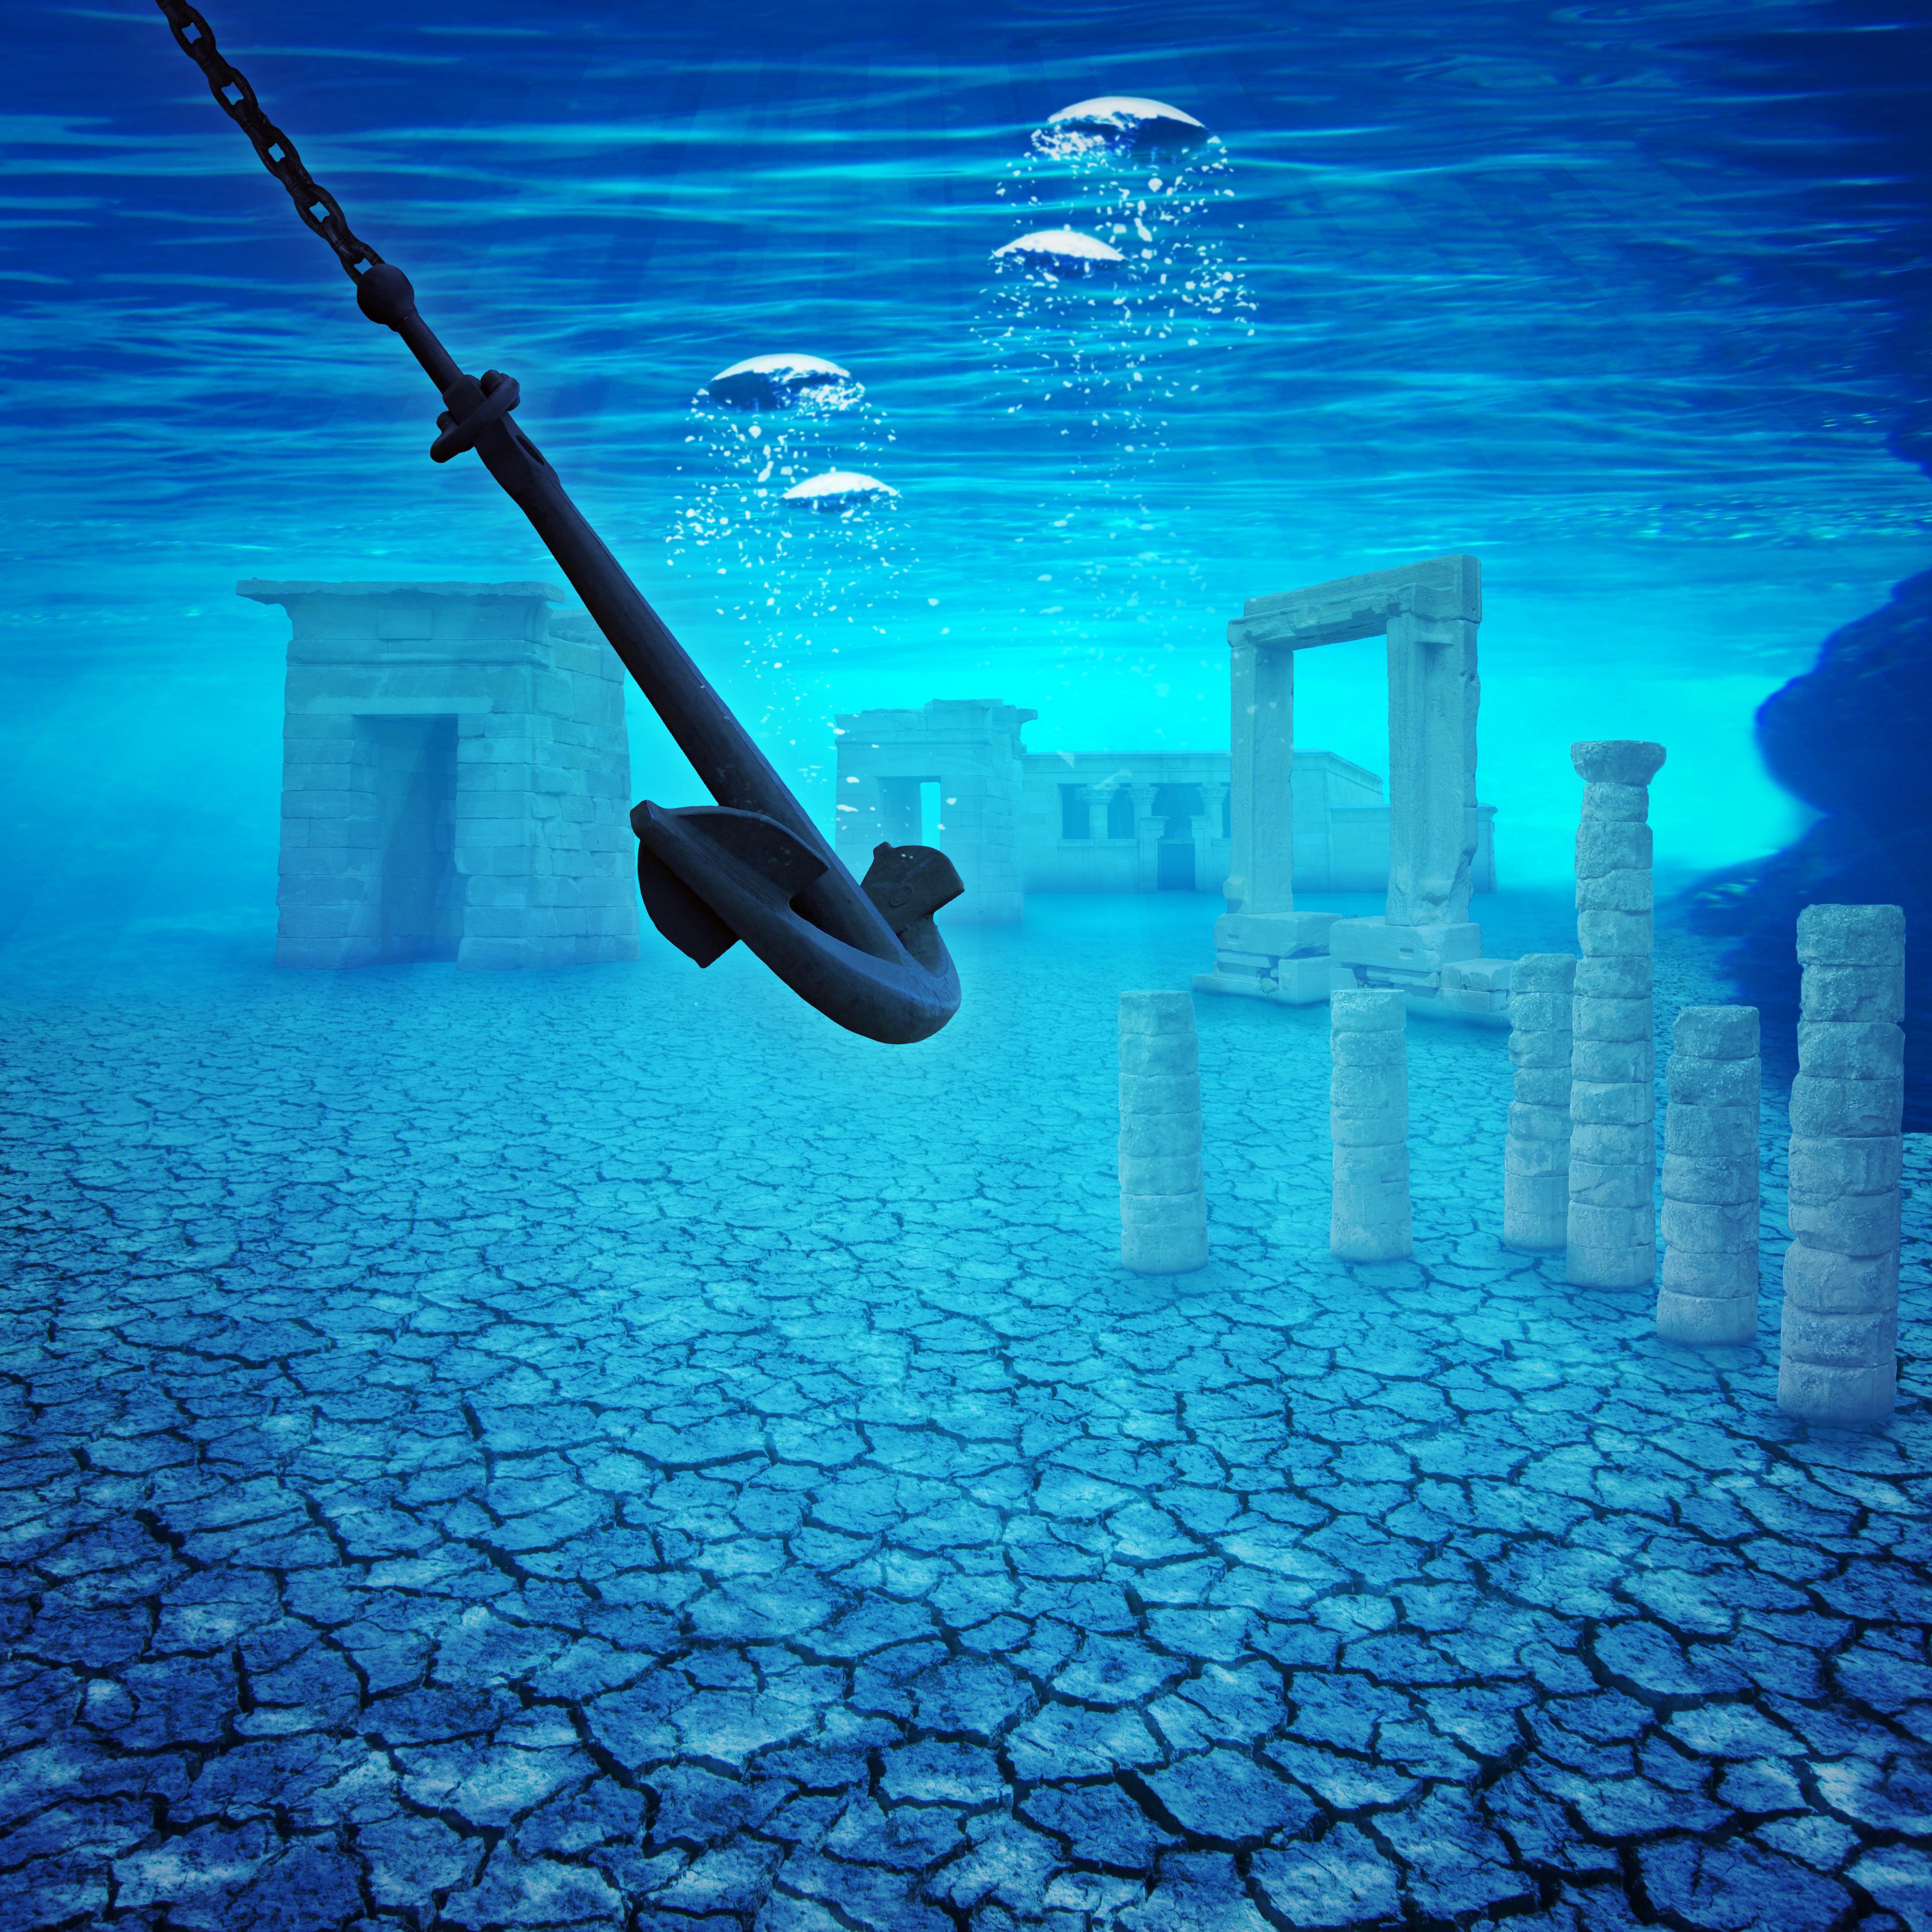 Underwater ruins by MaSi-83